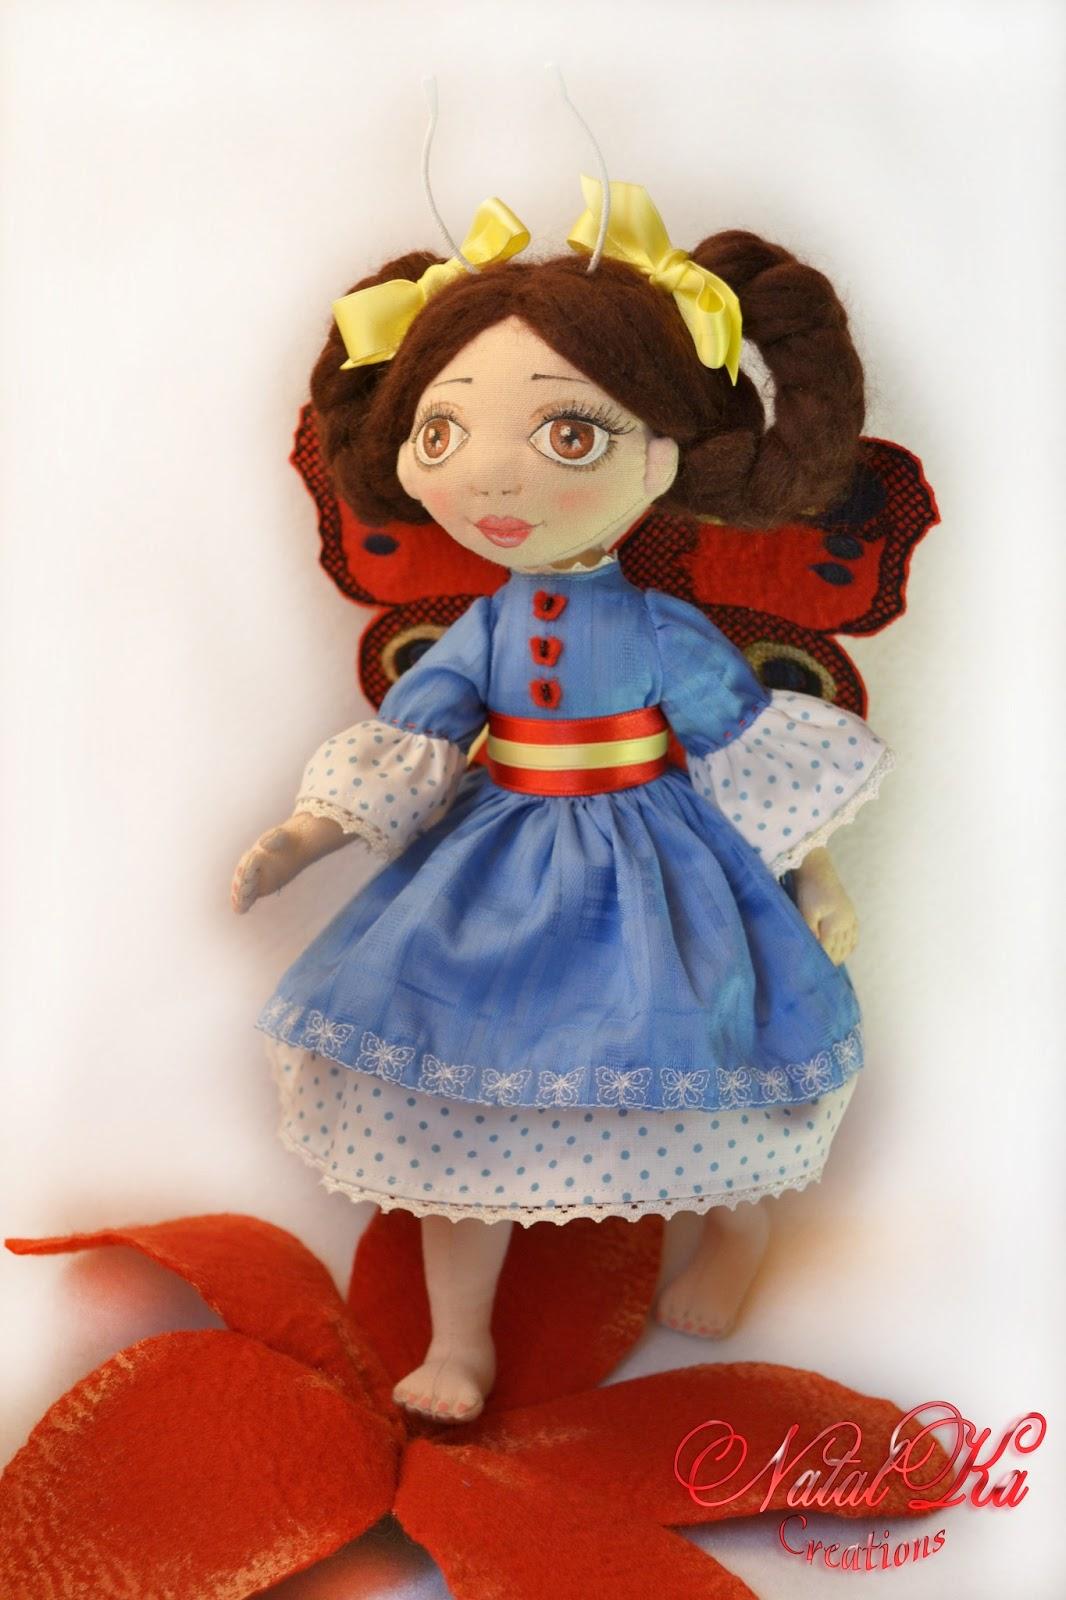 Авторская текстильная кукла от NatalKa Creations. Handgemachte Stoffpuppe von NatalKa Creations. Cloth art doll handmade by NatalKa Creations